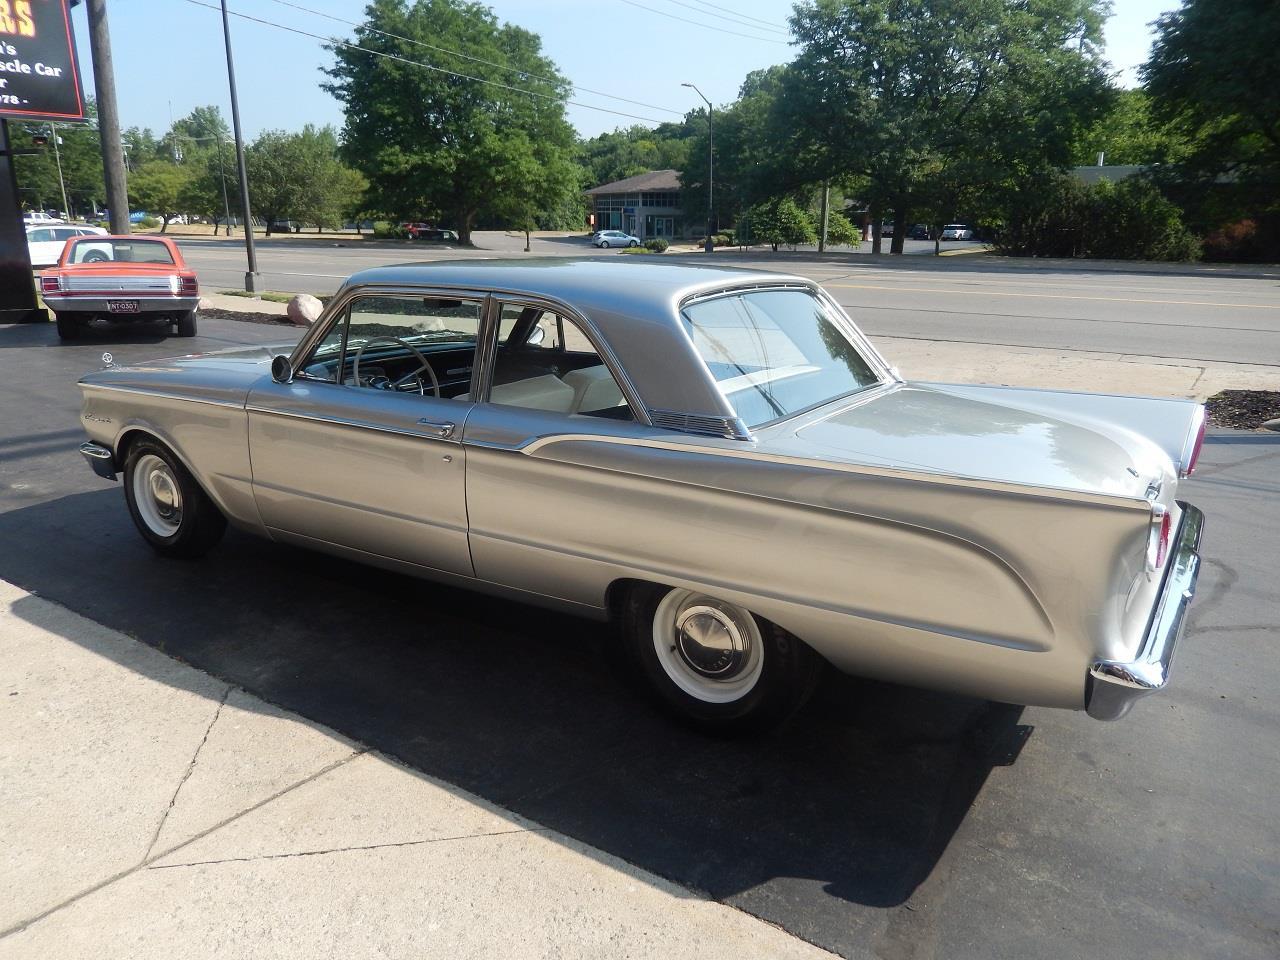 1960 Mercury Comet (CC-1362498) for sale in Clarkston, Michigan